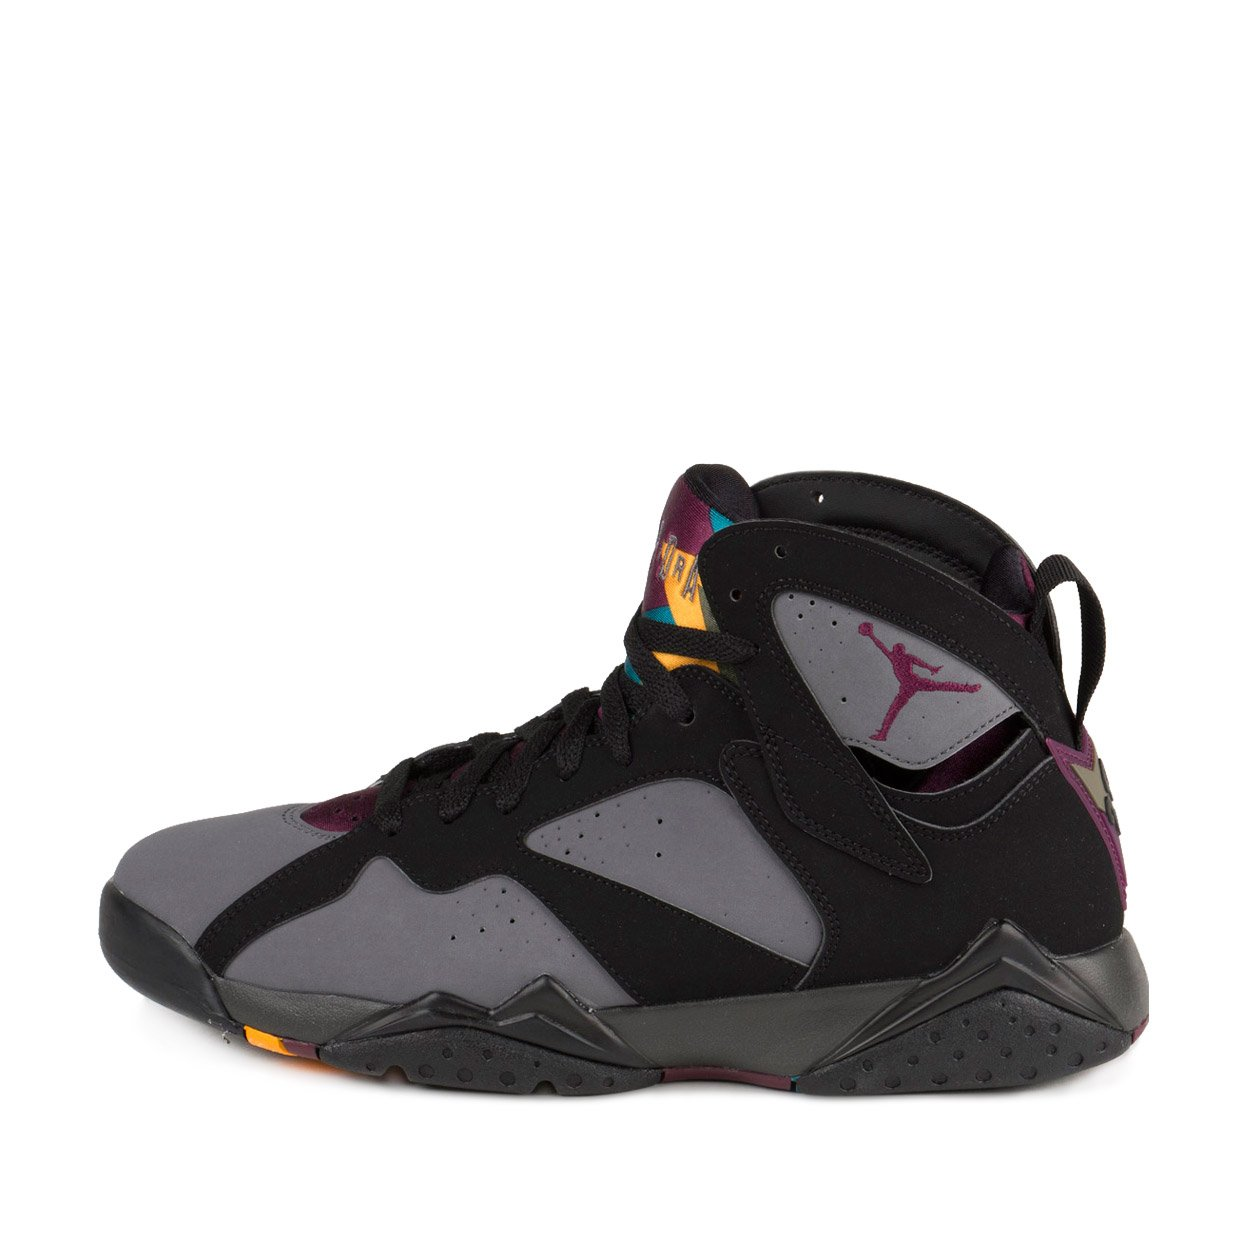 83667caf3fb00a Galleon - Nike Mens Air Jordan 7 Retro